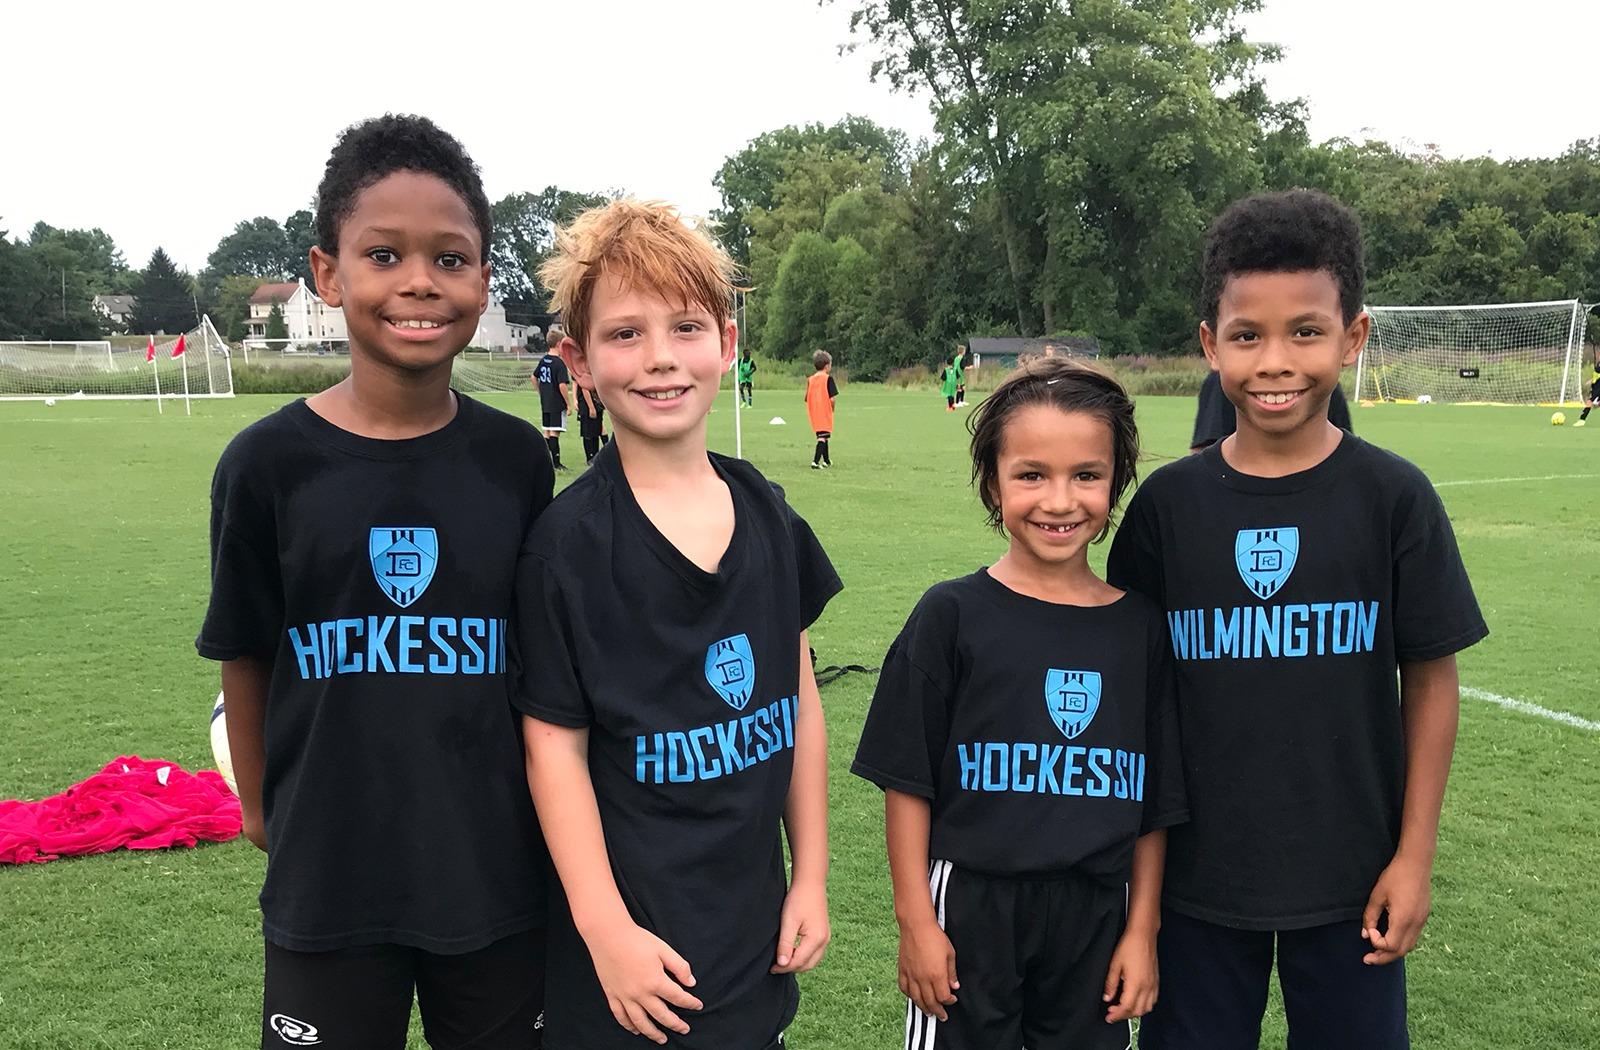 Delaware FC Wilmington and Hockessin - Preseason Academy